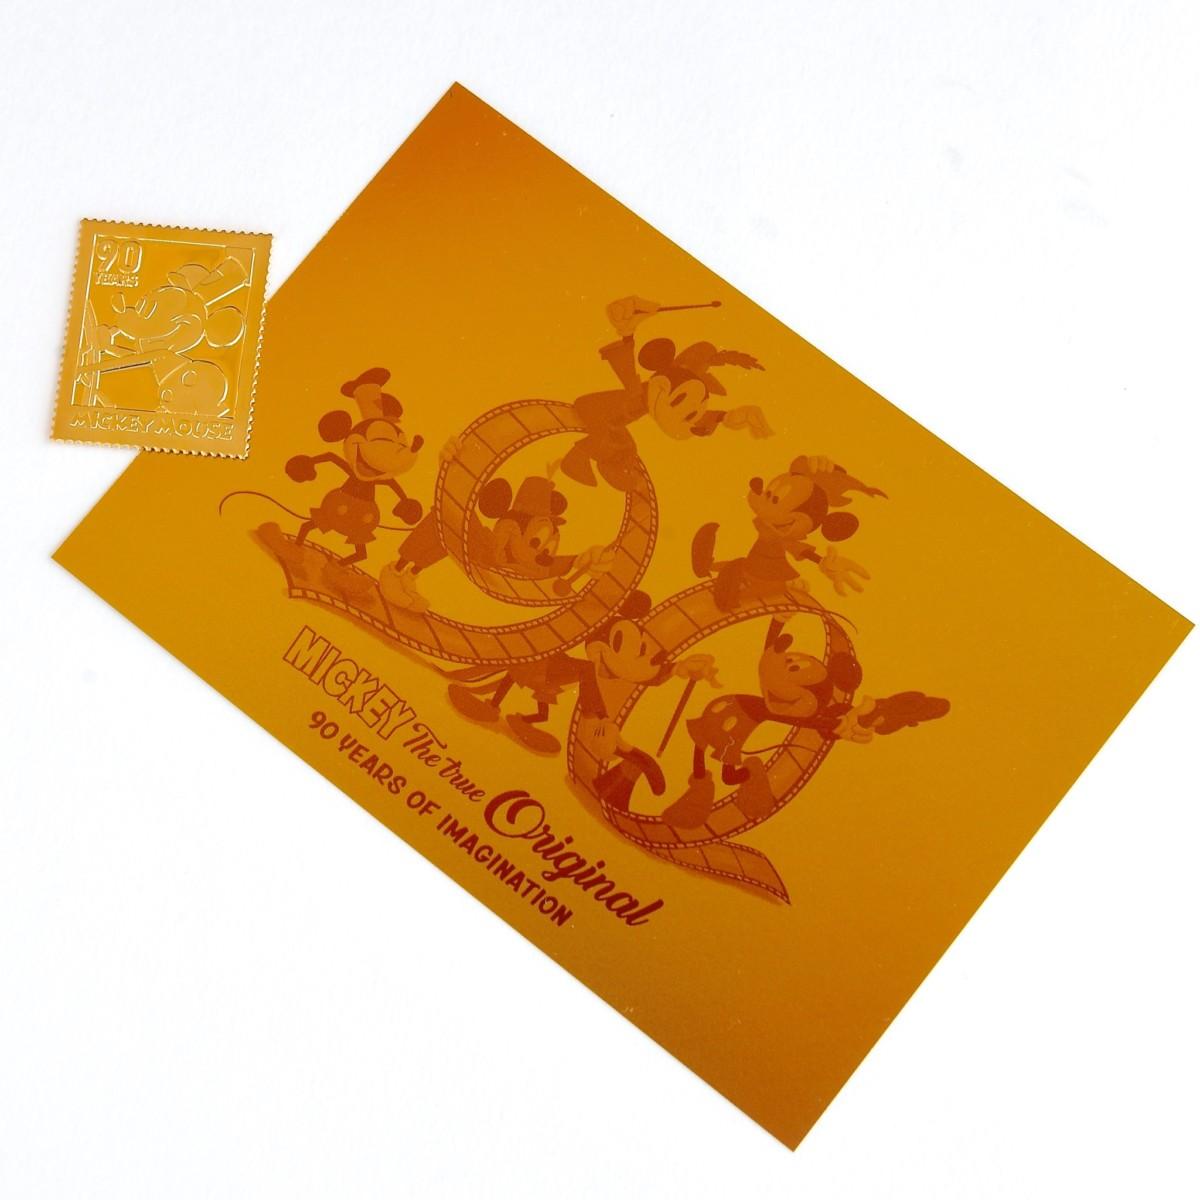 W純金アイテム額装セットミッキーマウス90周年 純金ポストカード 切手型純金プレート